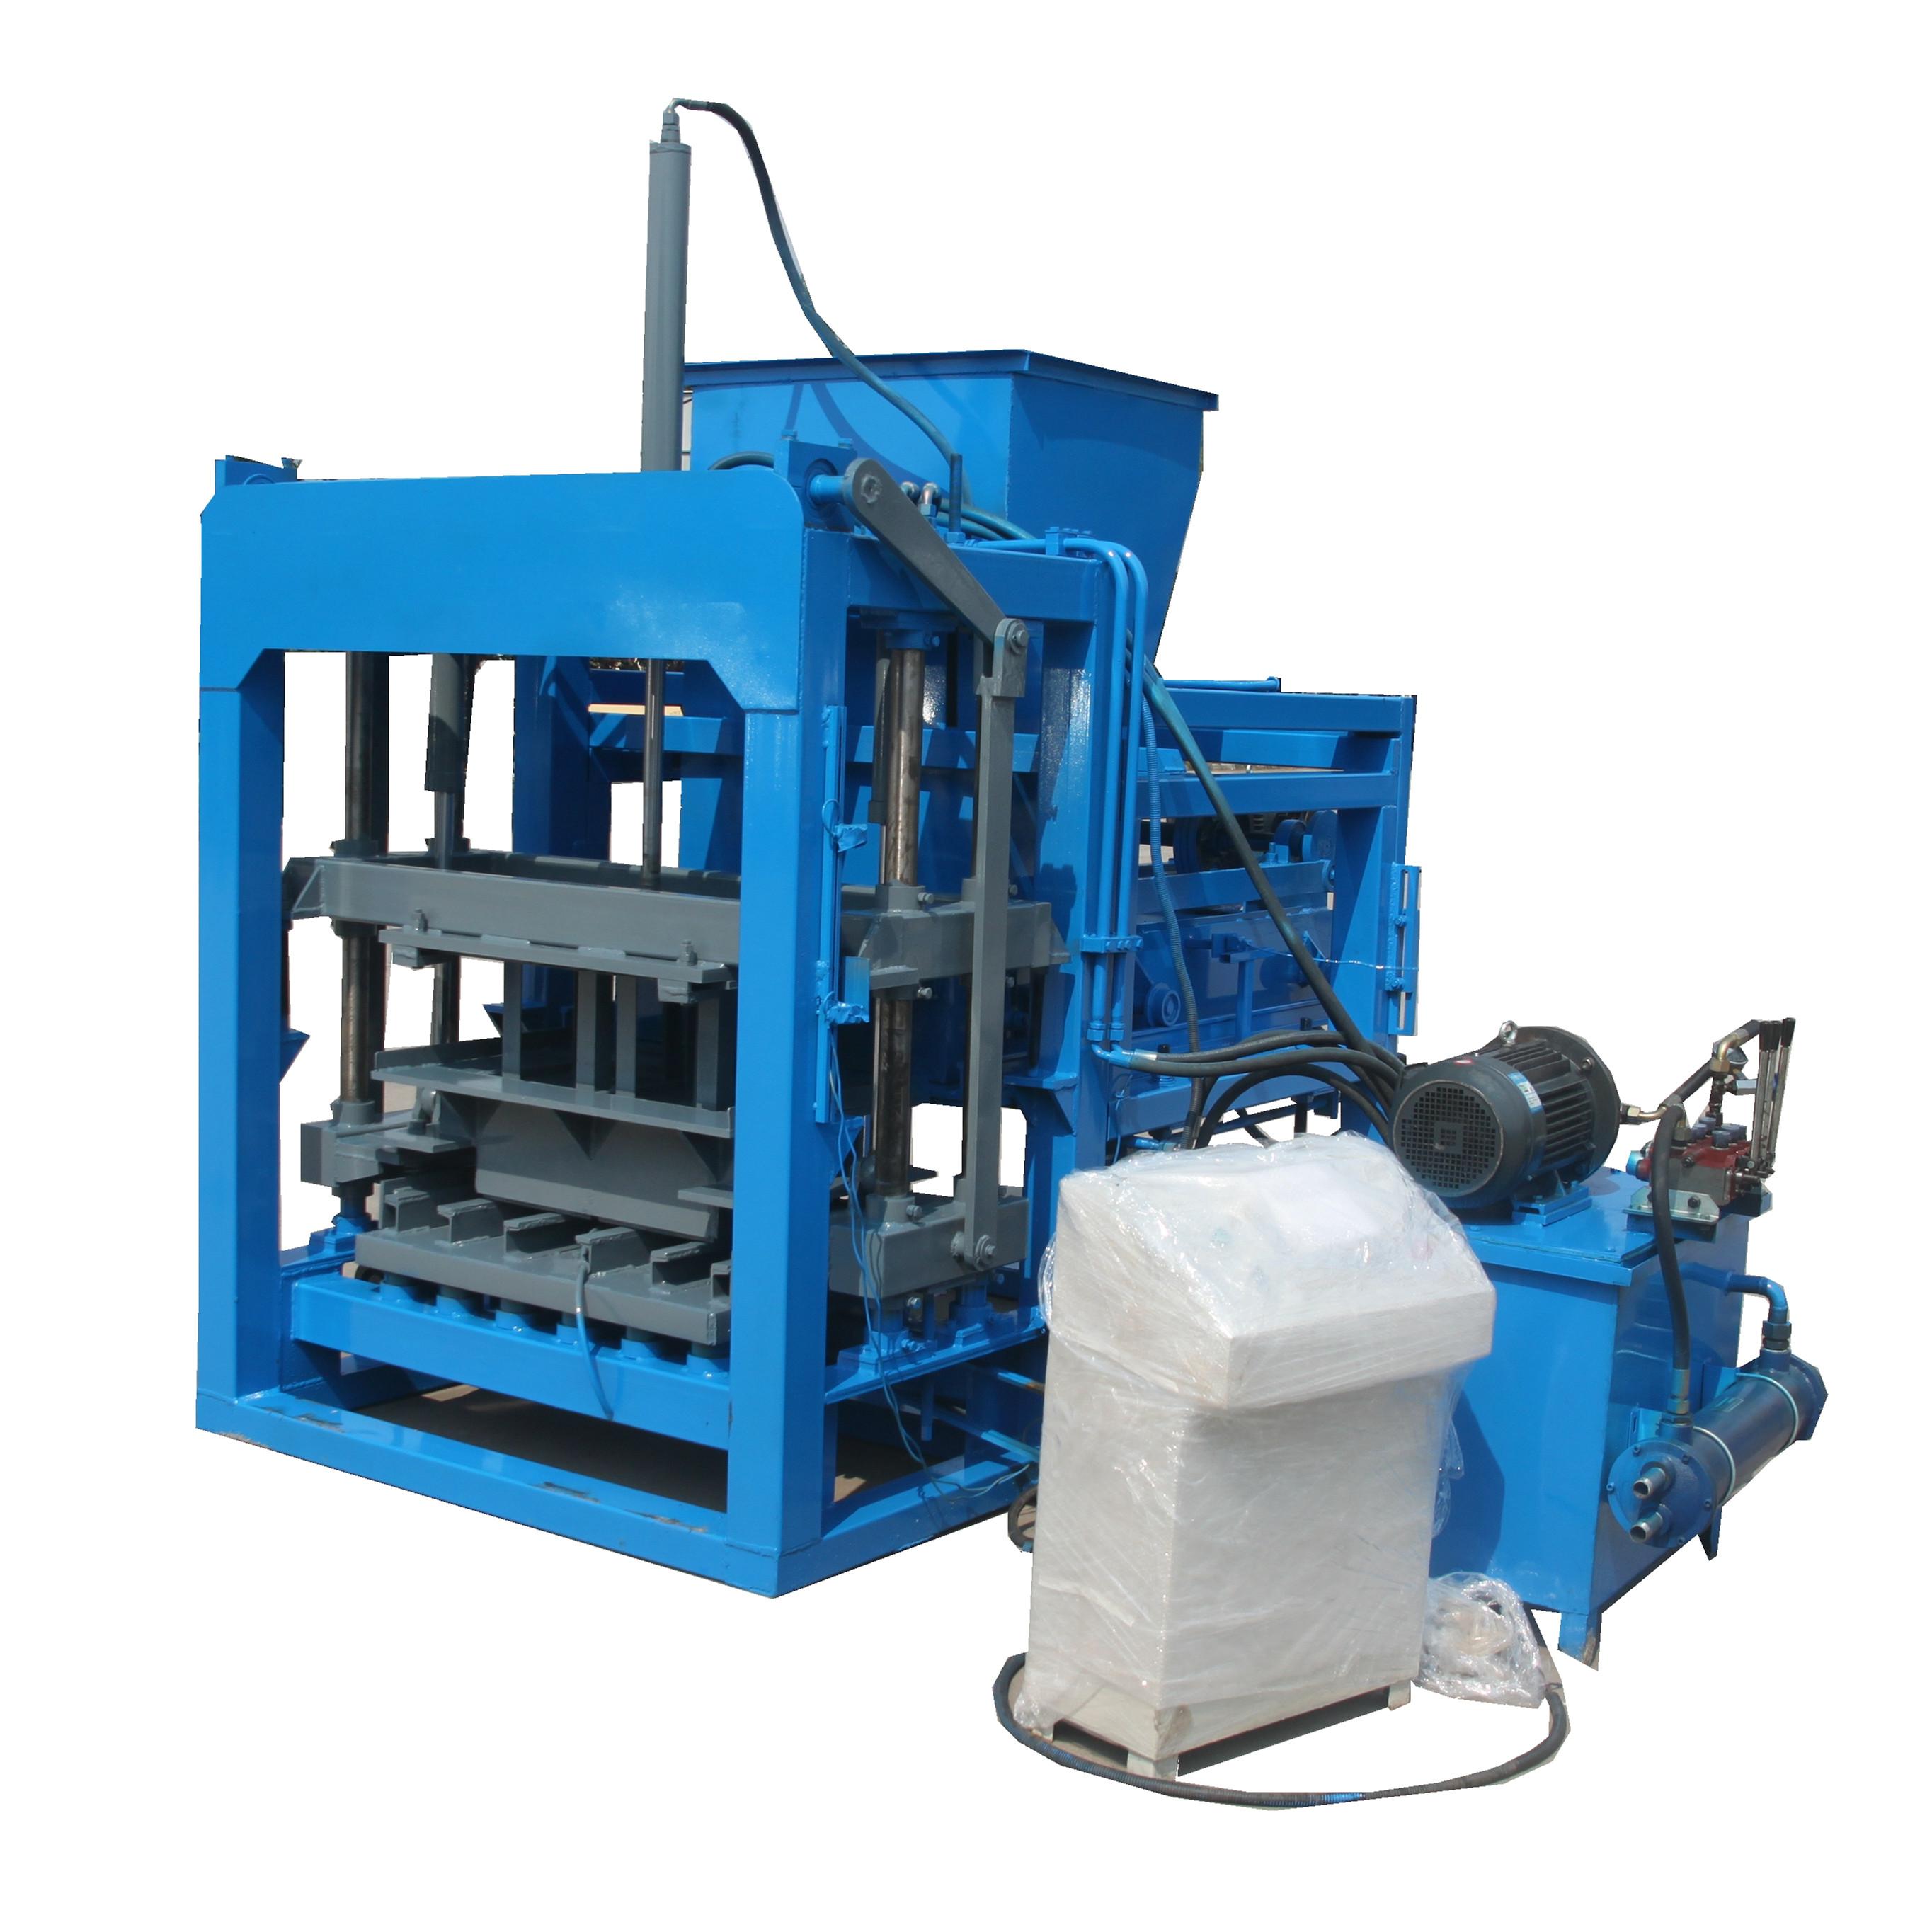 QT4-28 Semi automatic hydraulic block making machine Featured Image